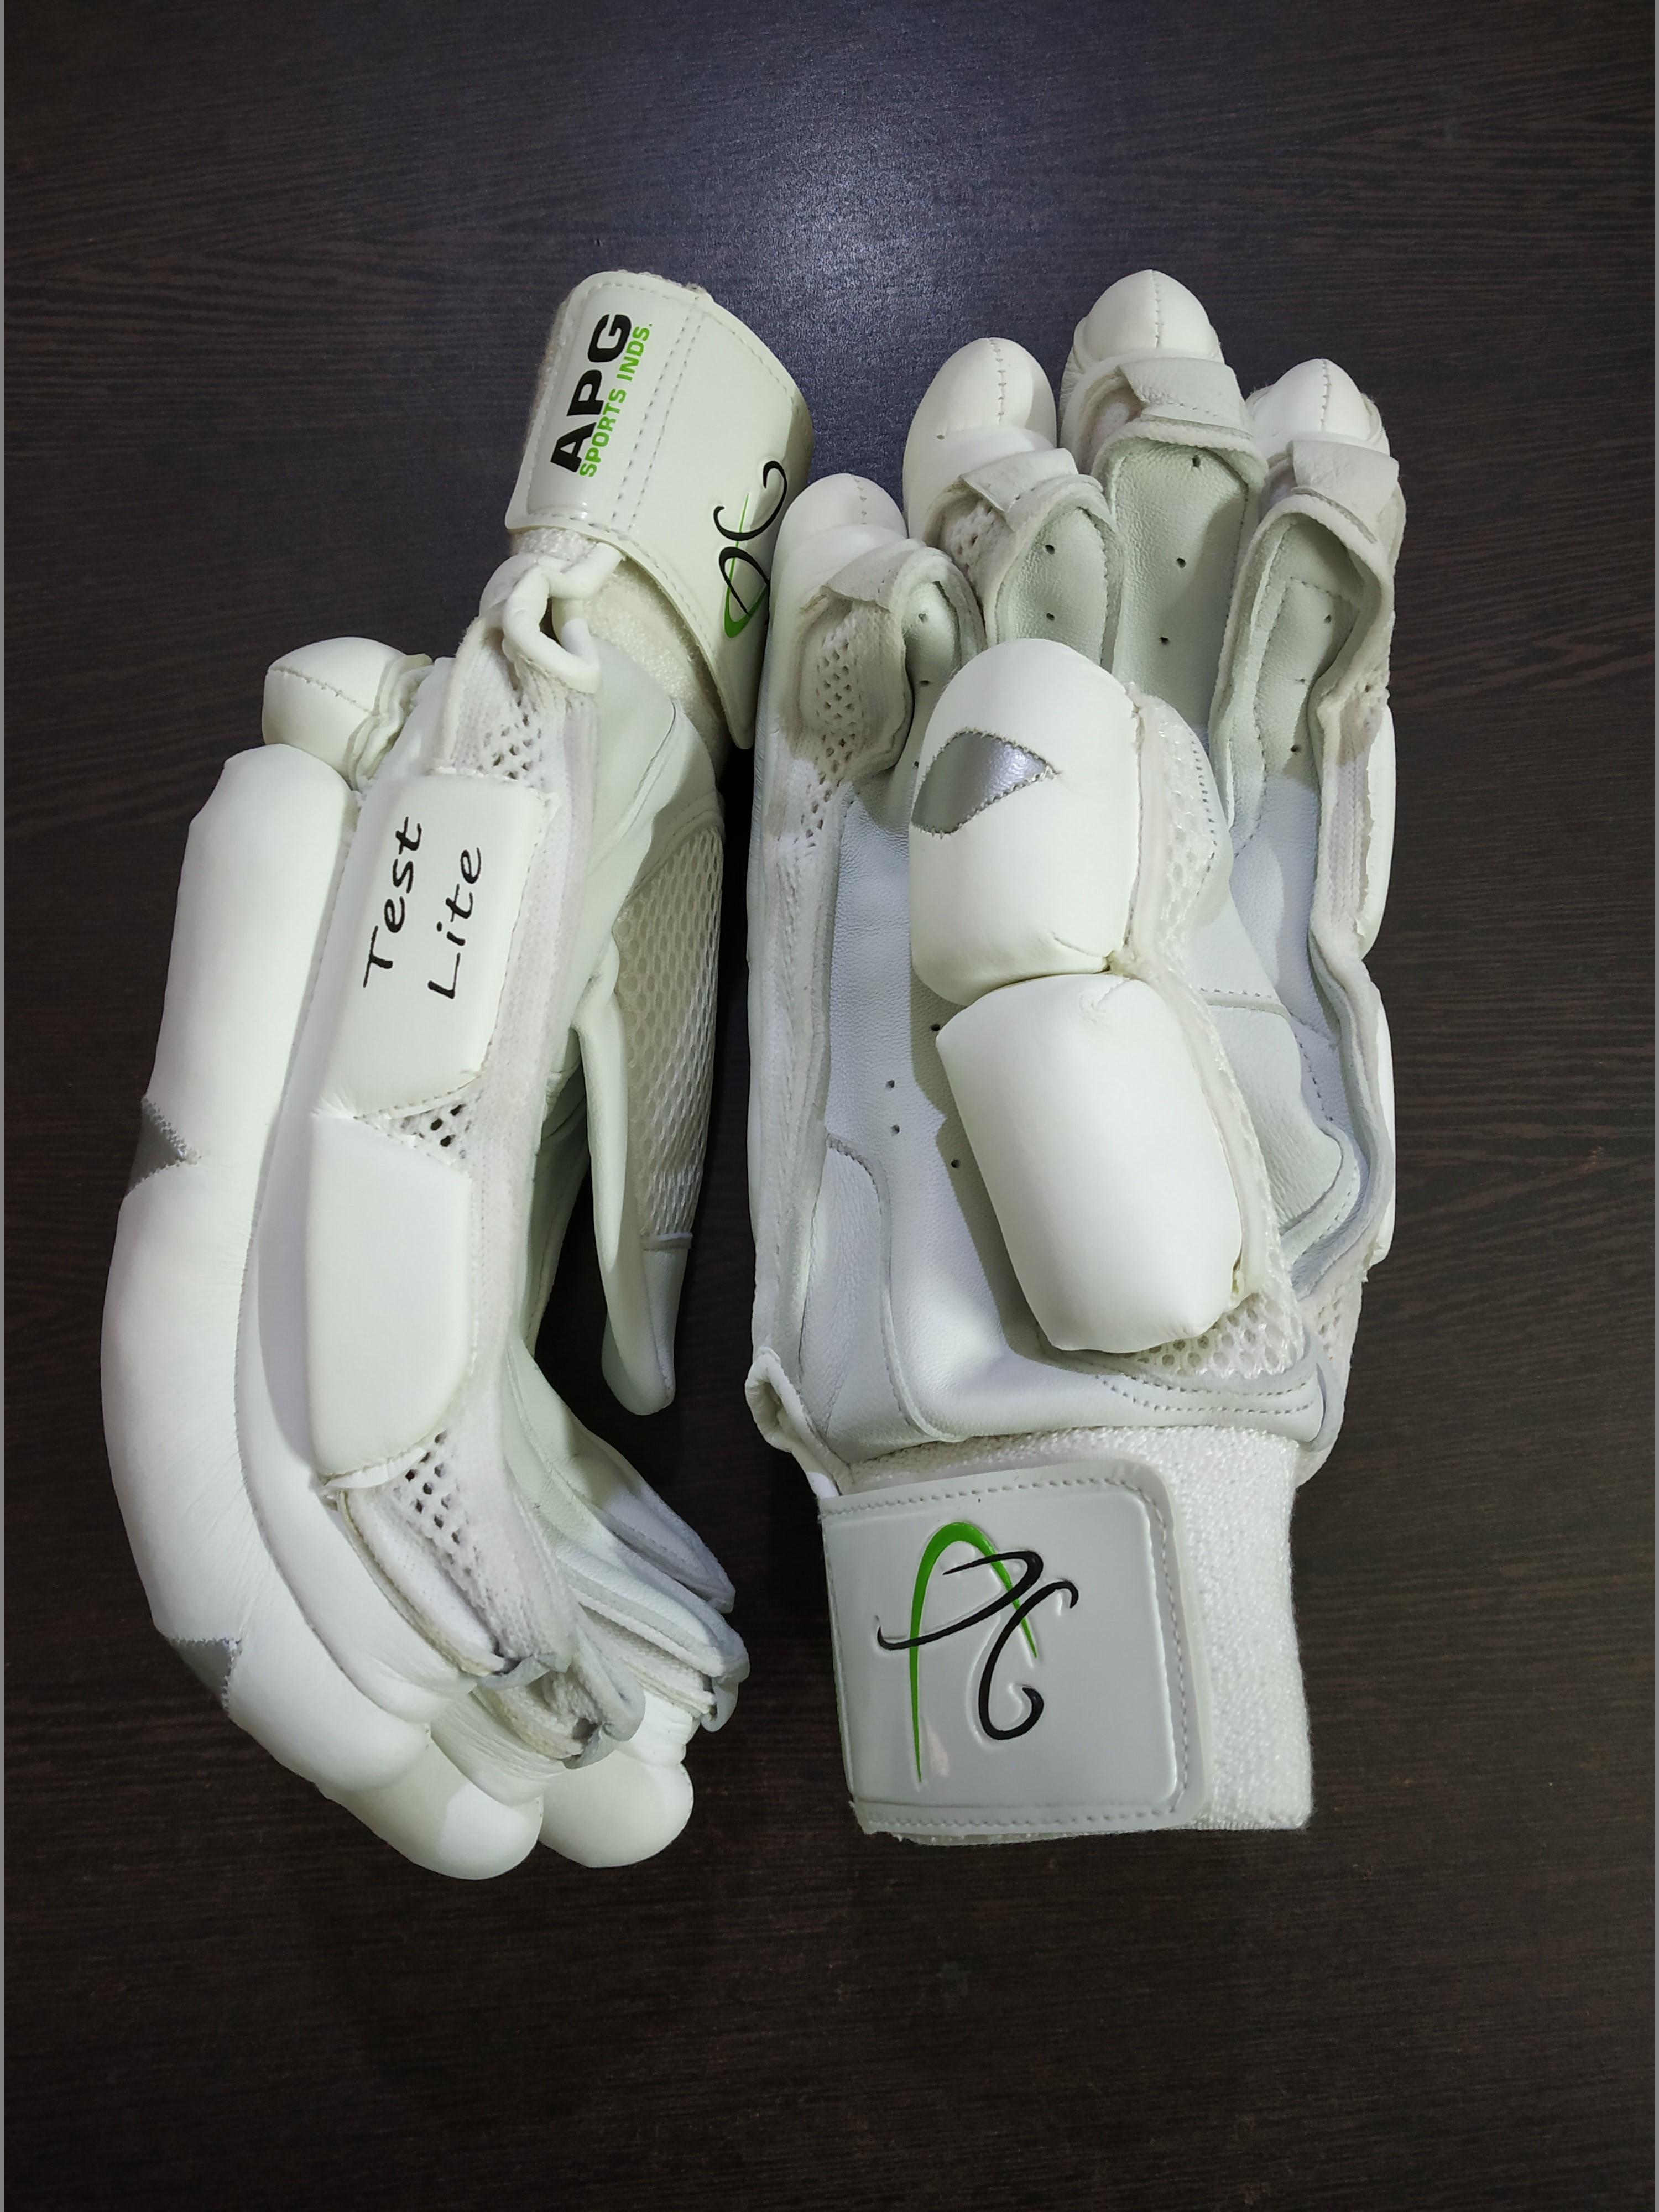 APG Test Lite Cricket Batting Gloves